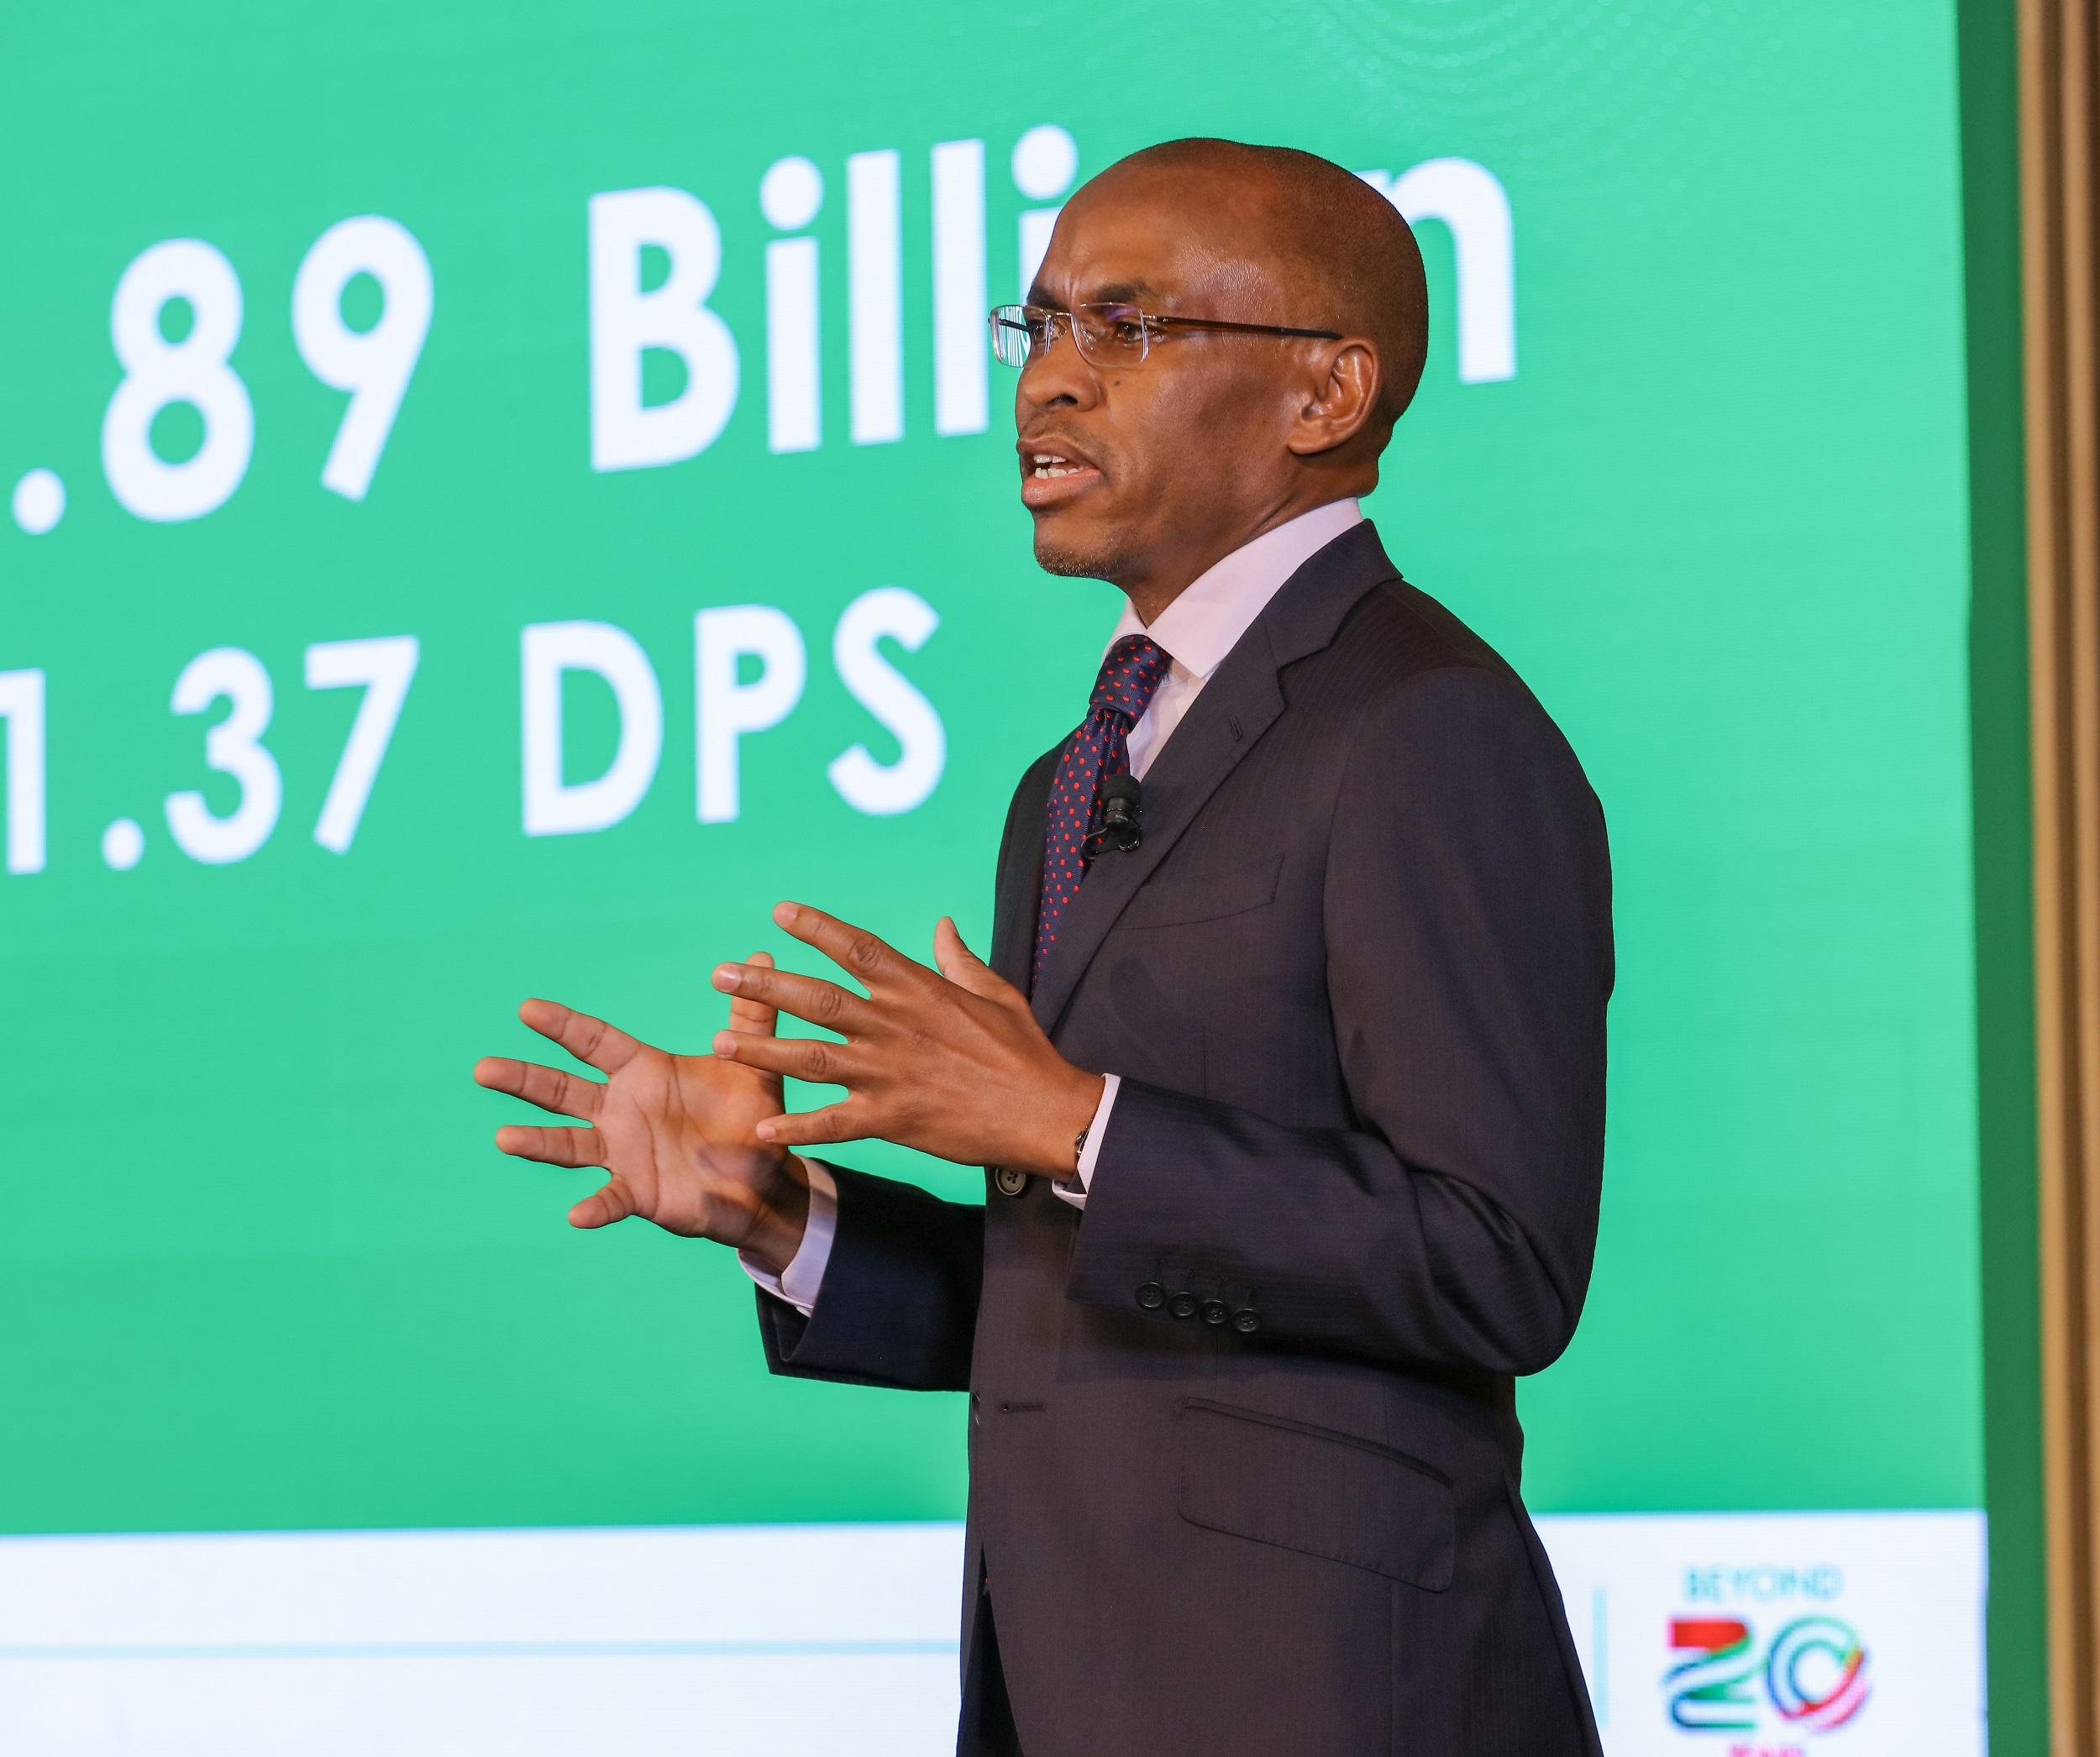 Peter Ndegwa Safaricom CEO - Safaricom 2020 Profit